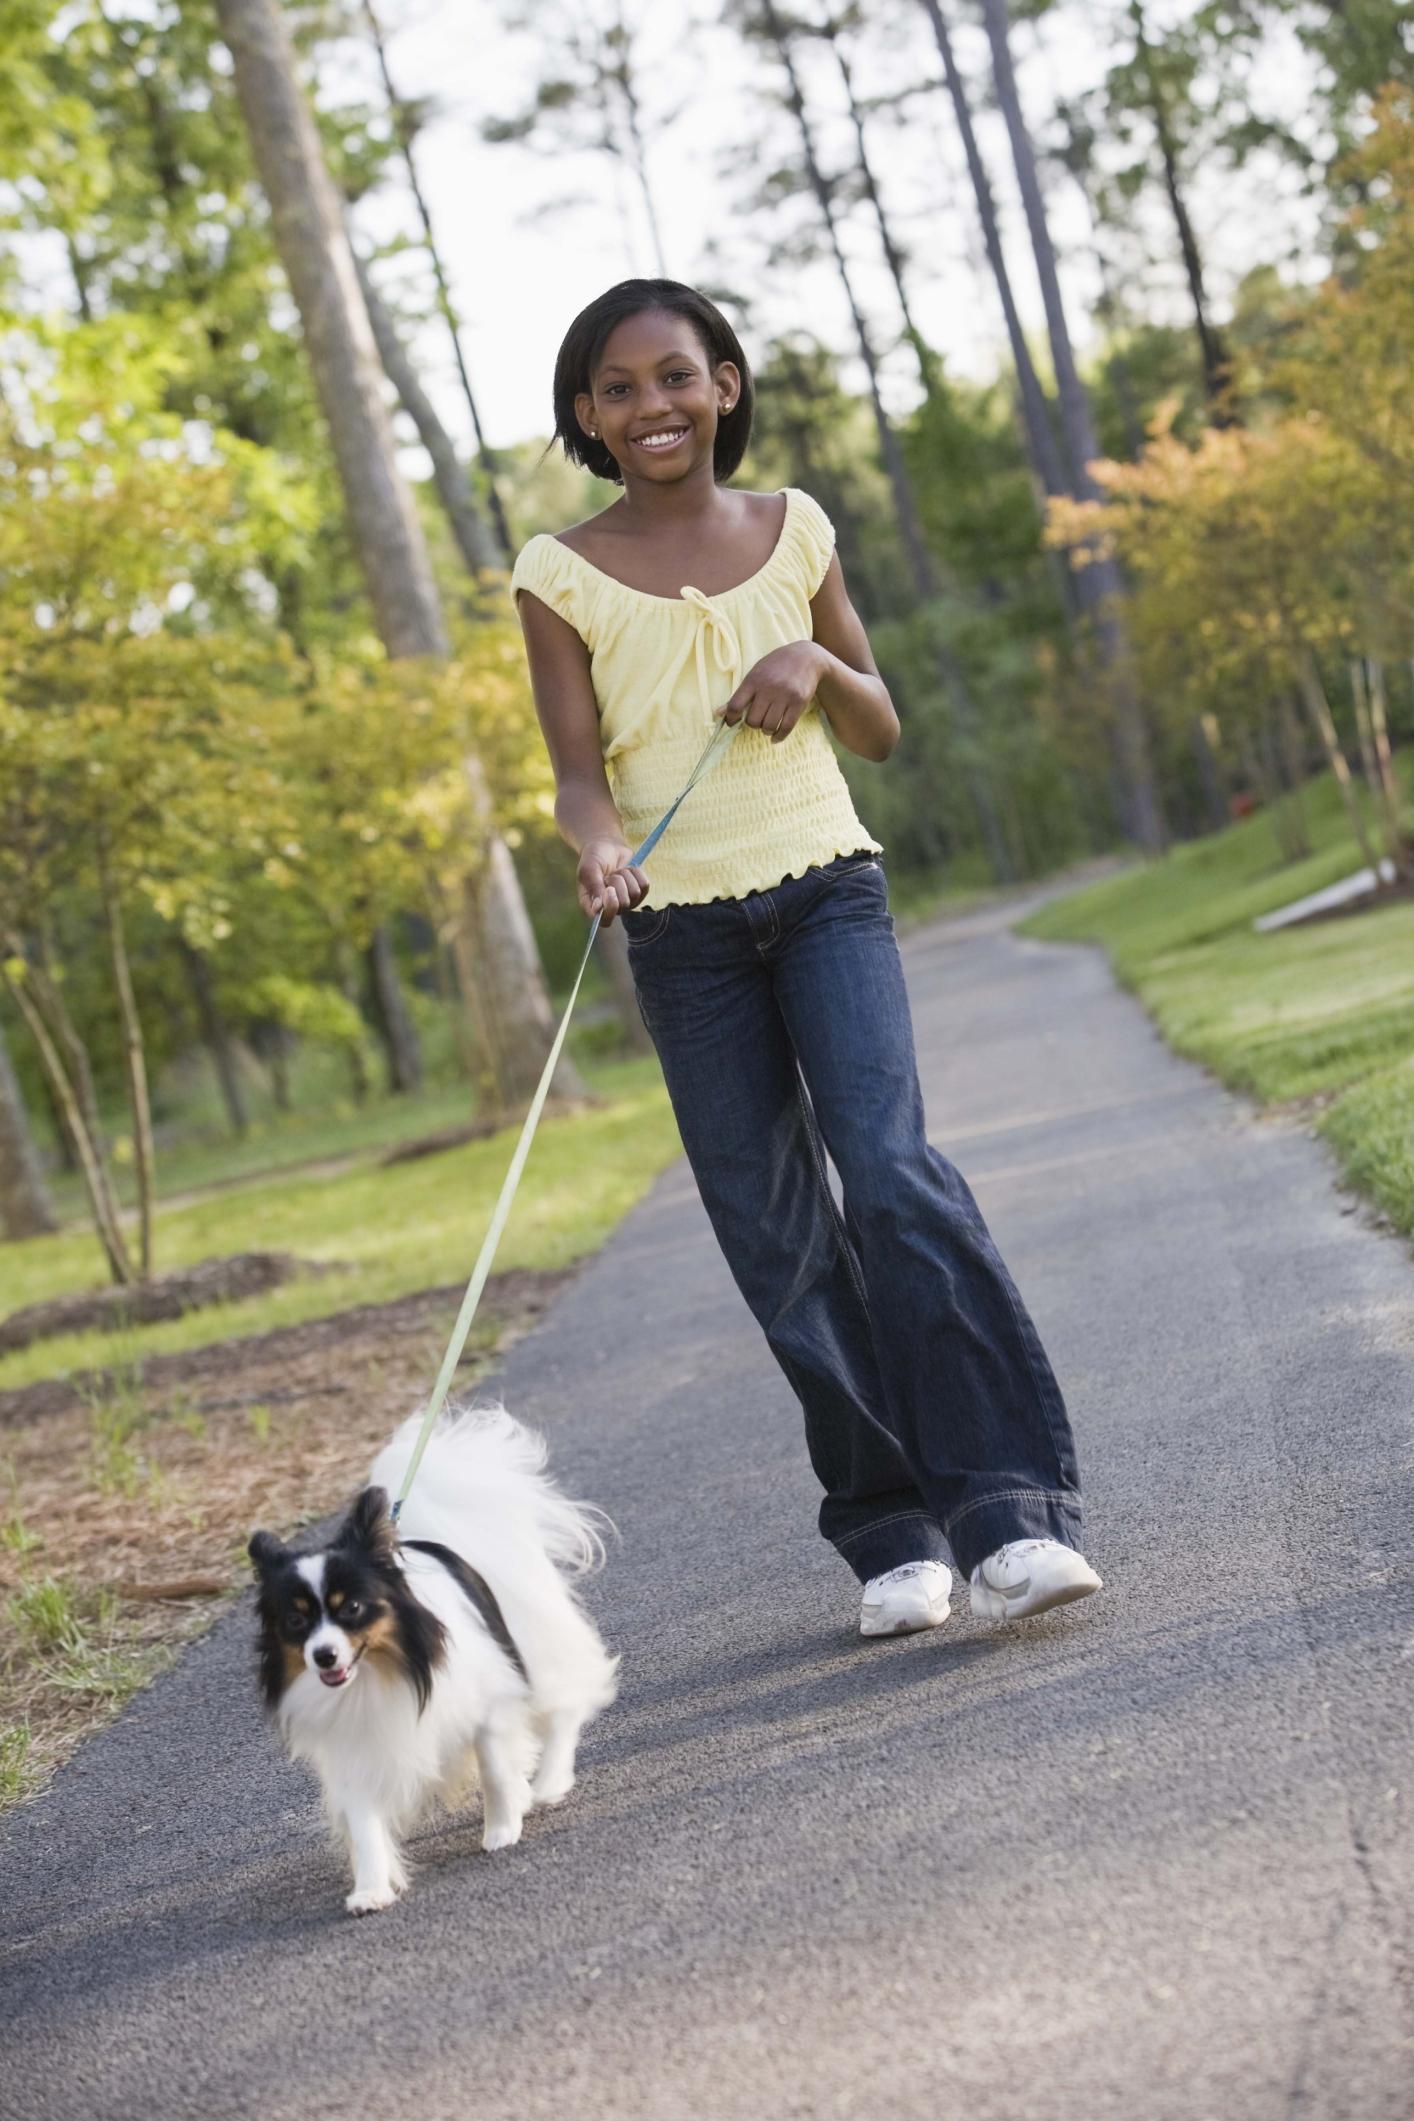 Dog Grooming Jobs For Teens Work Chron Com